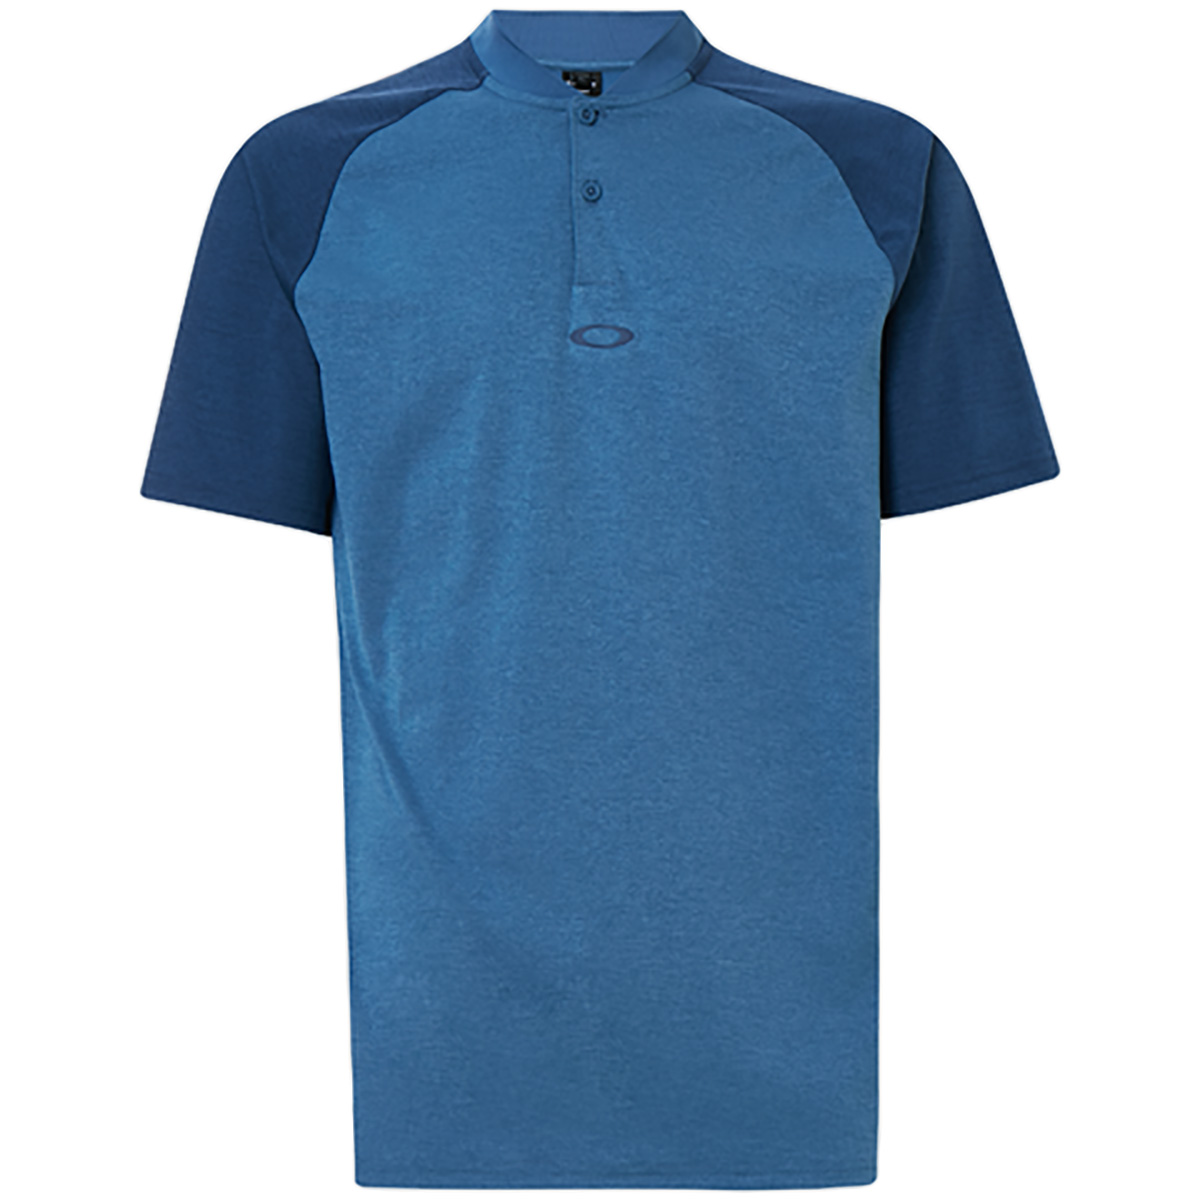 ICON BI COLOR 半袖ポロシャツ